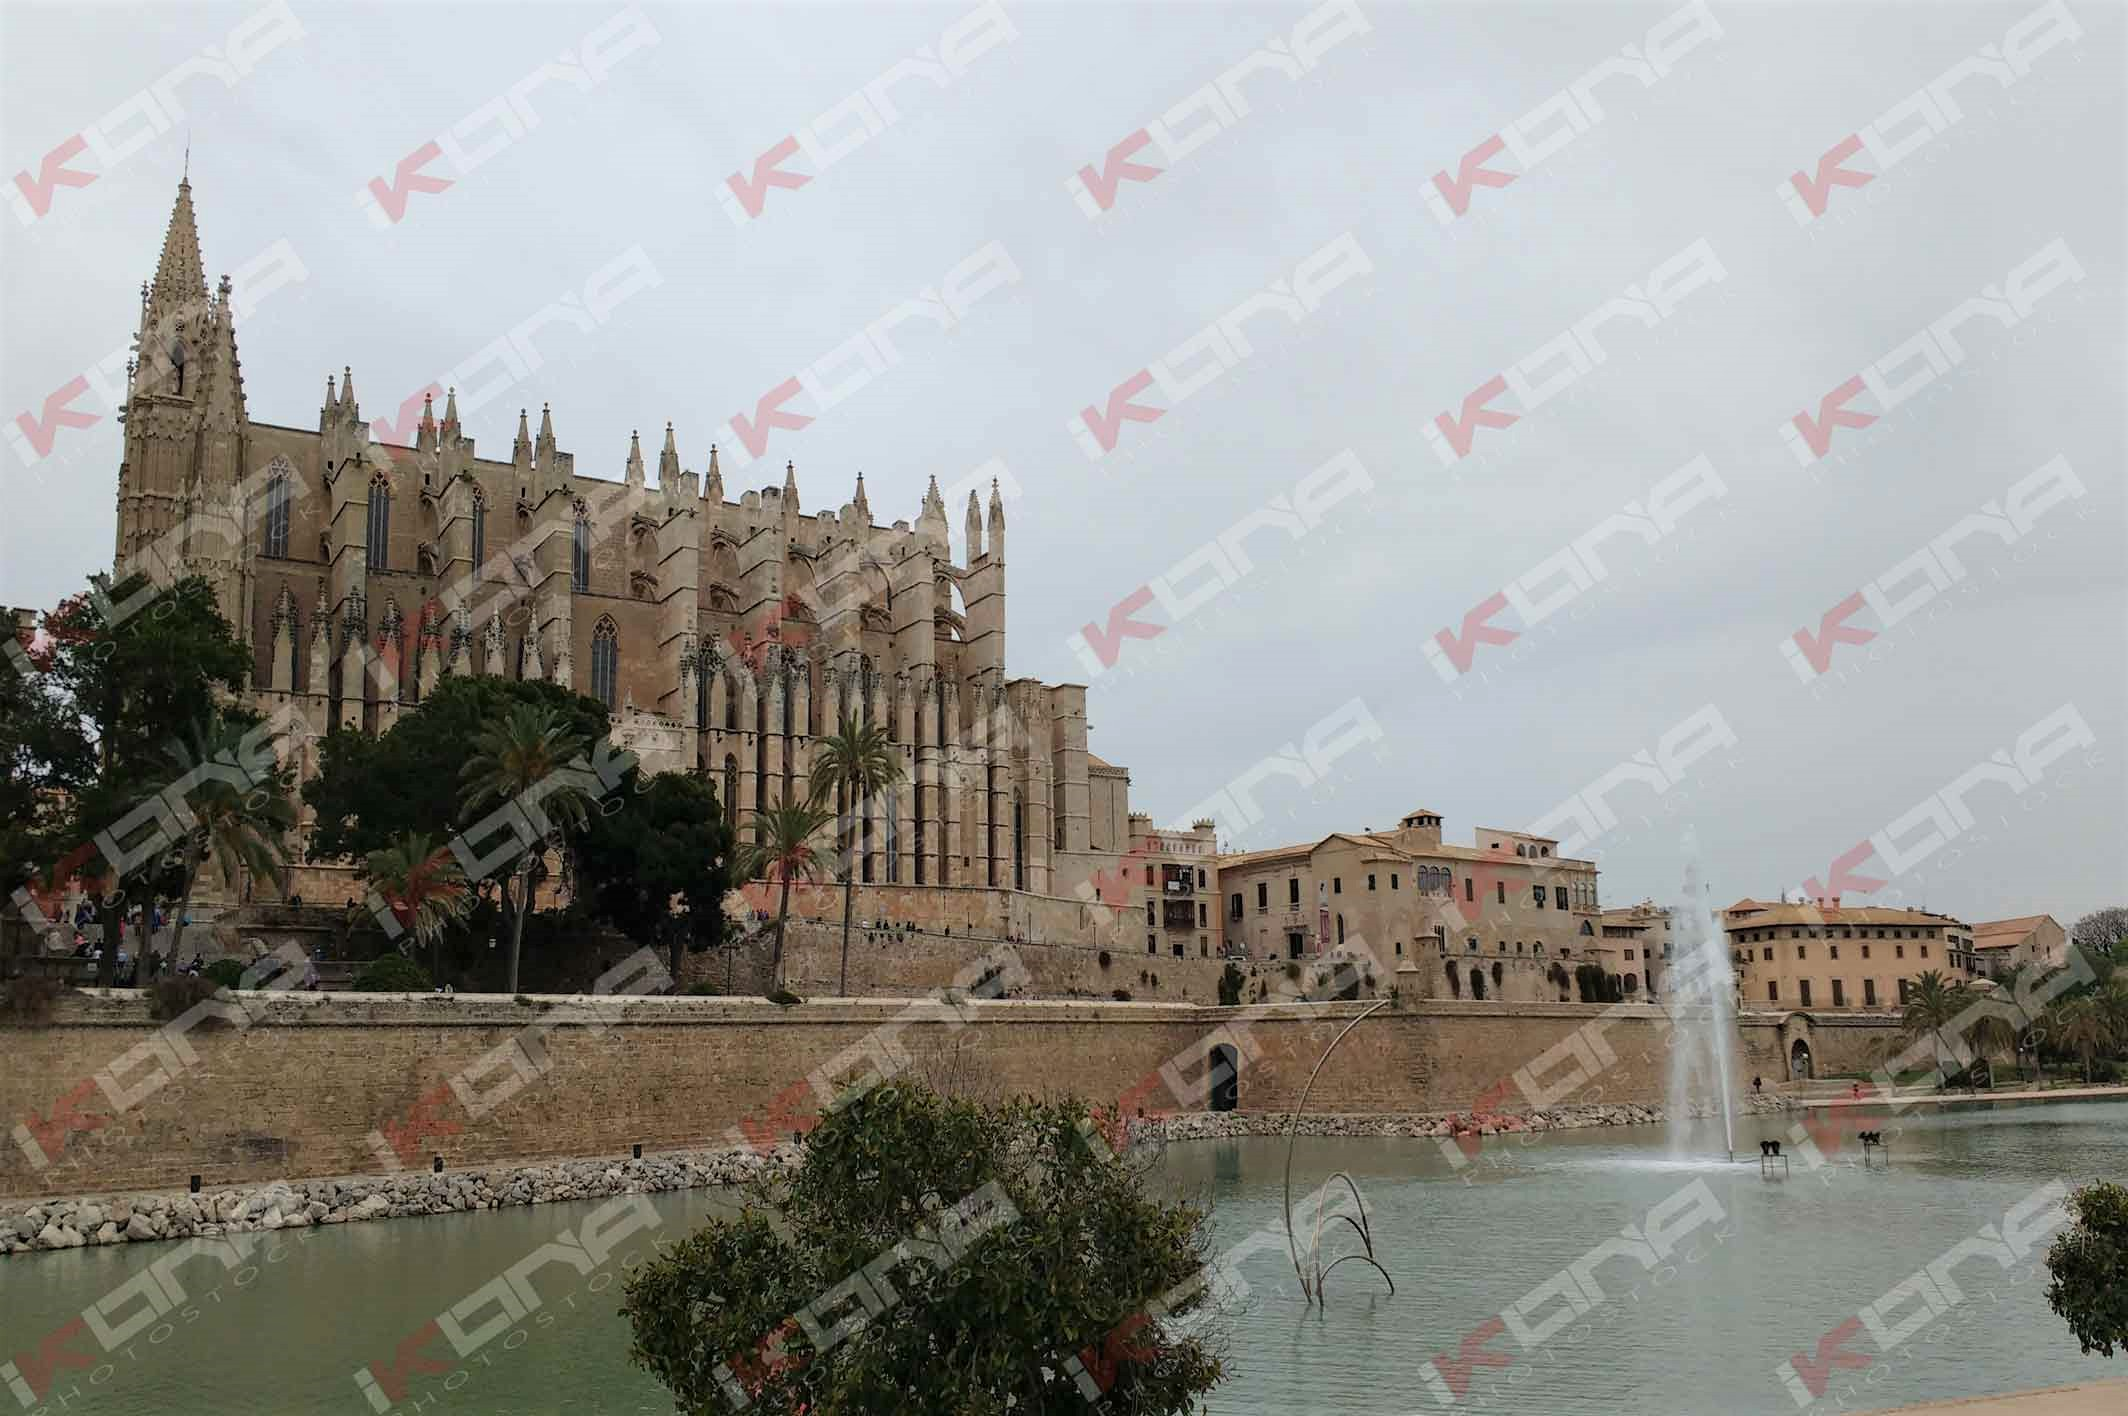 Palma de mallorca cathedral gaudi spain 2016 ikona stock for Kenay home mallorca